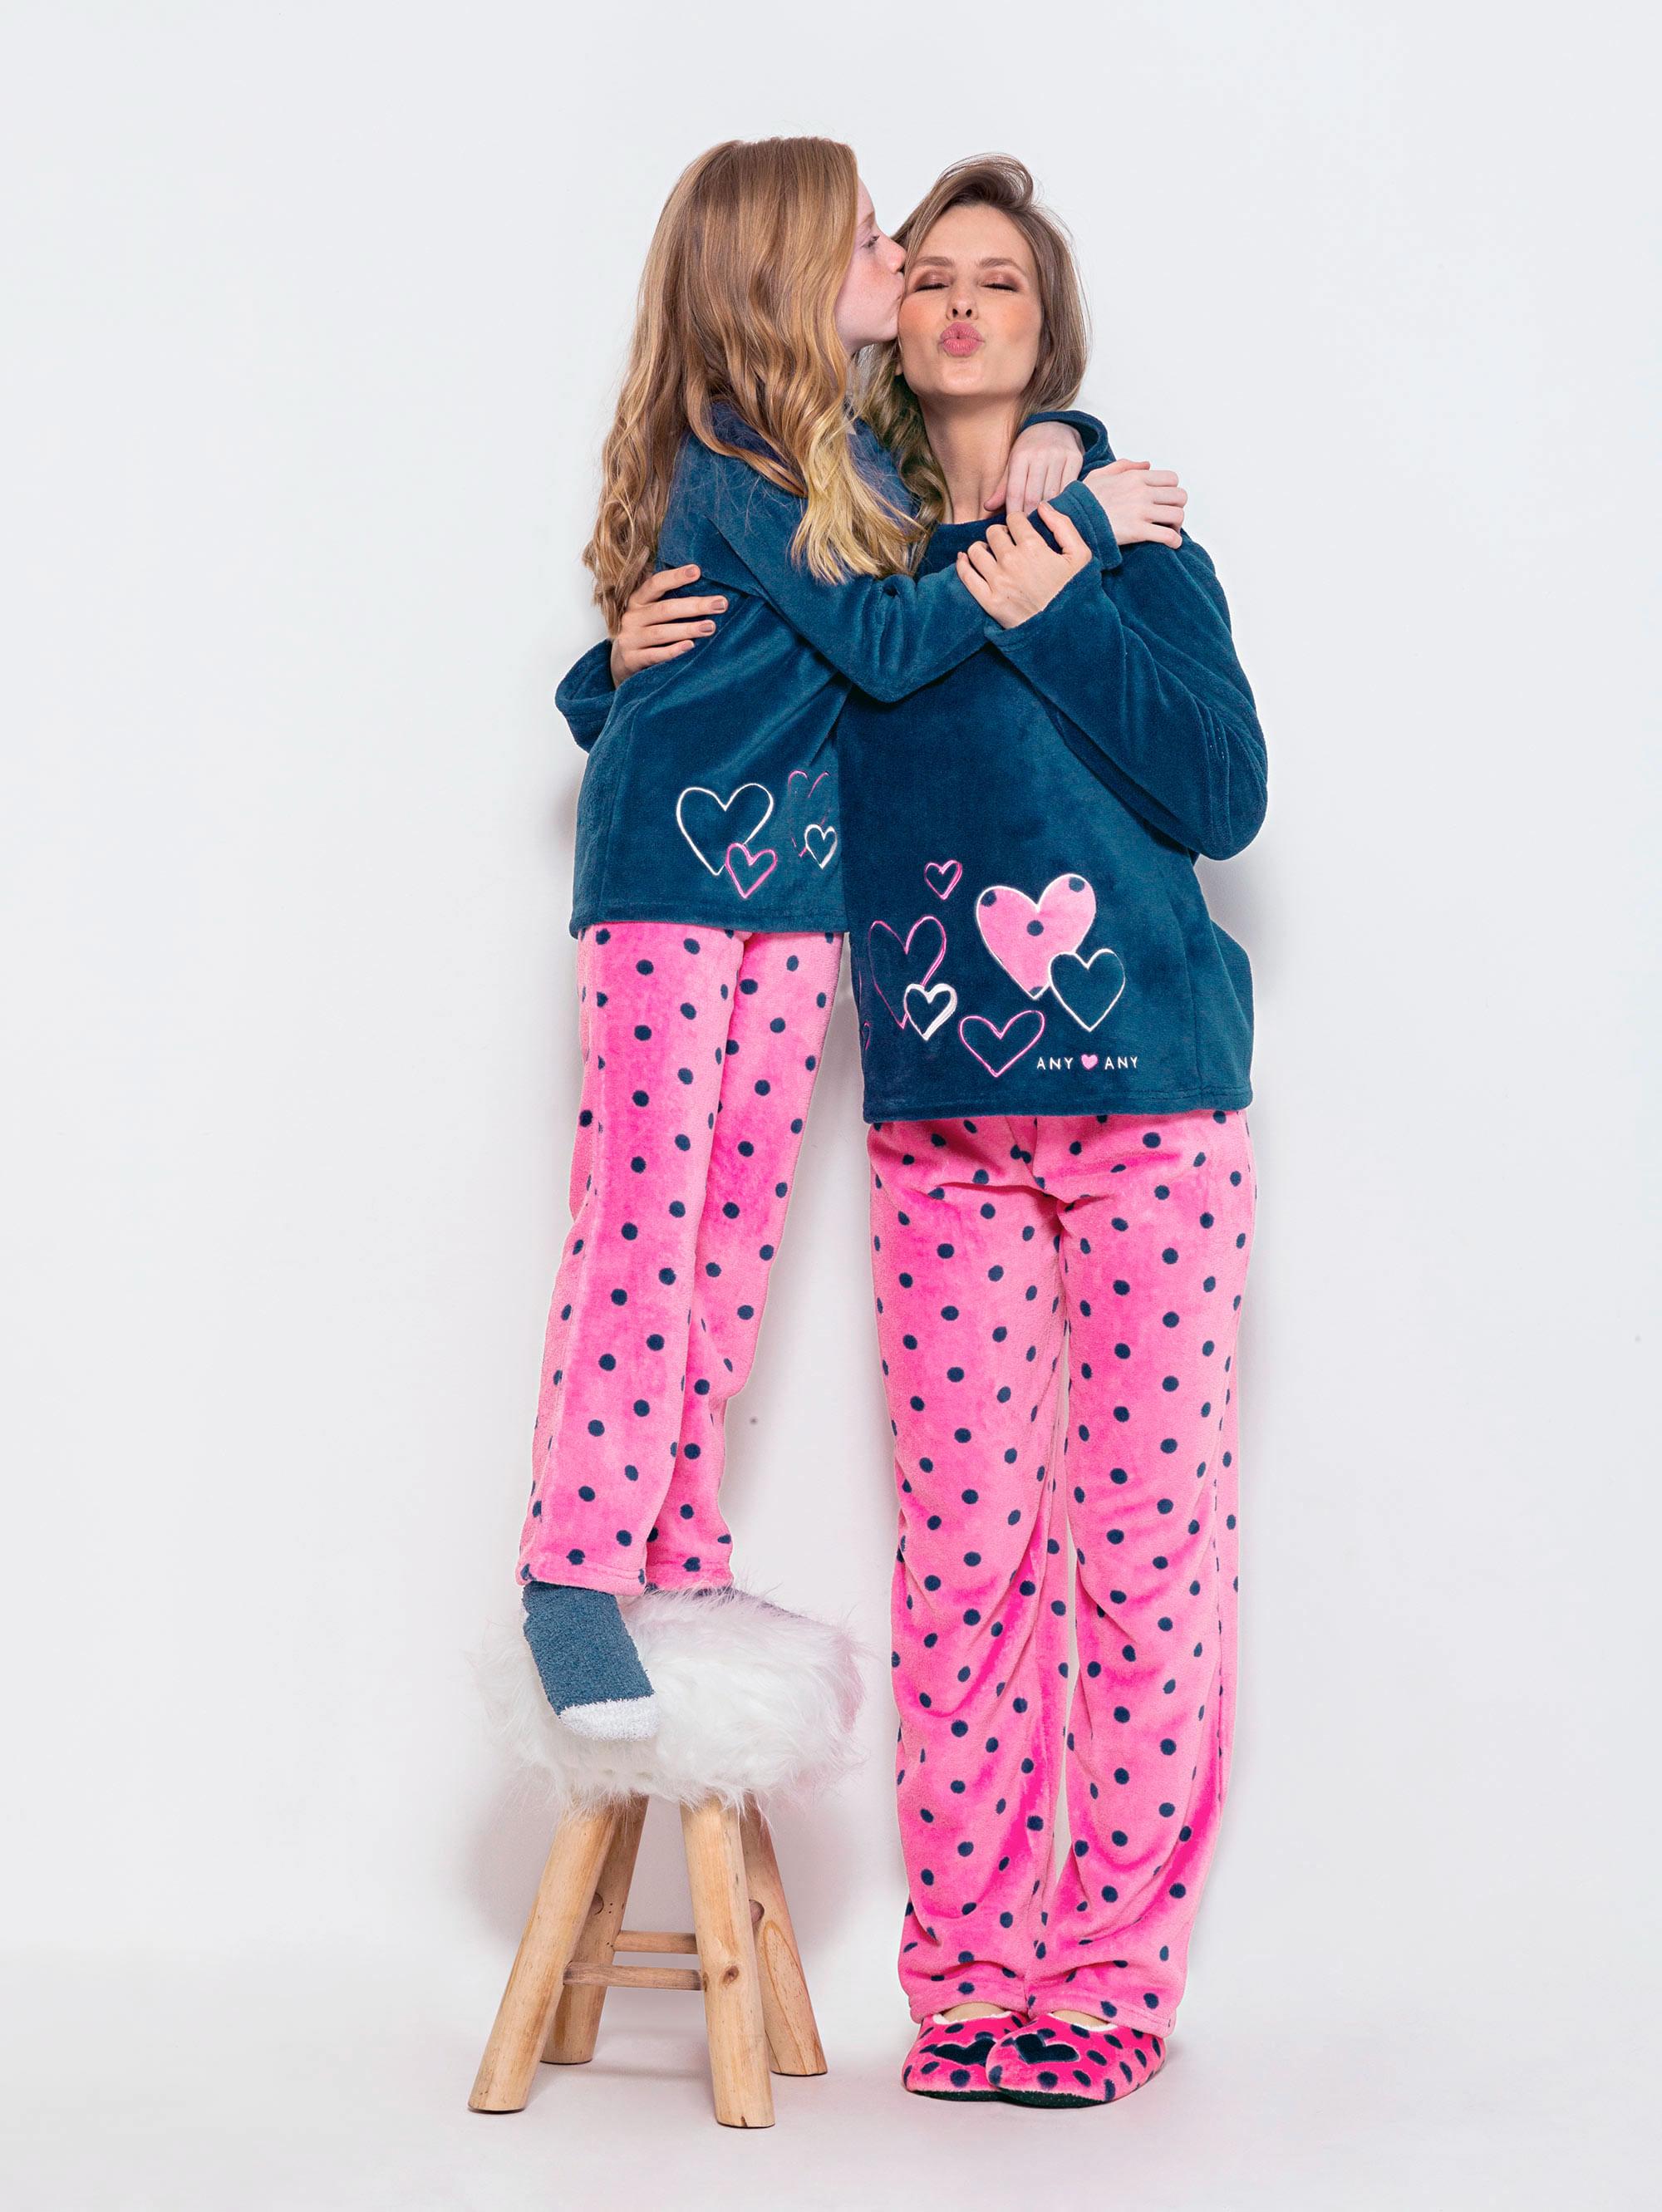 Pijama-Longo-Manga-Longa-Soft-Infantil-Feminino-Dots-Hearts-04.01.1514